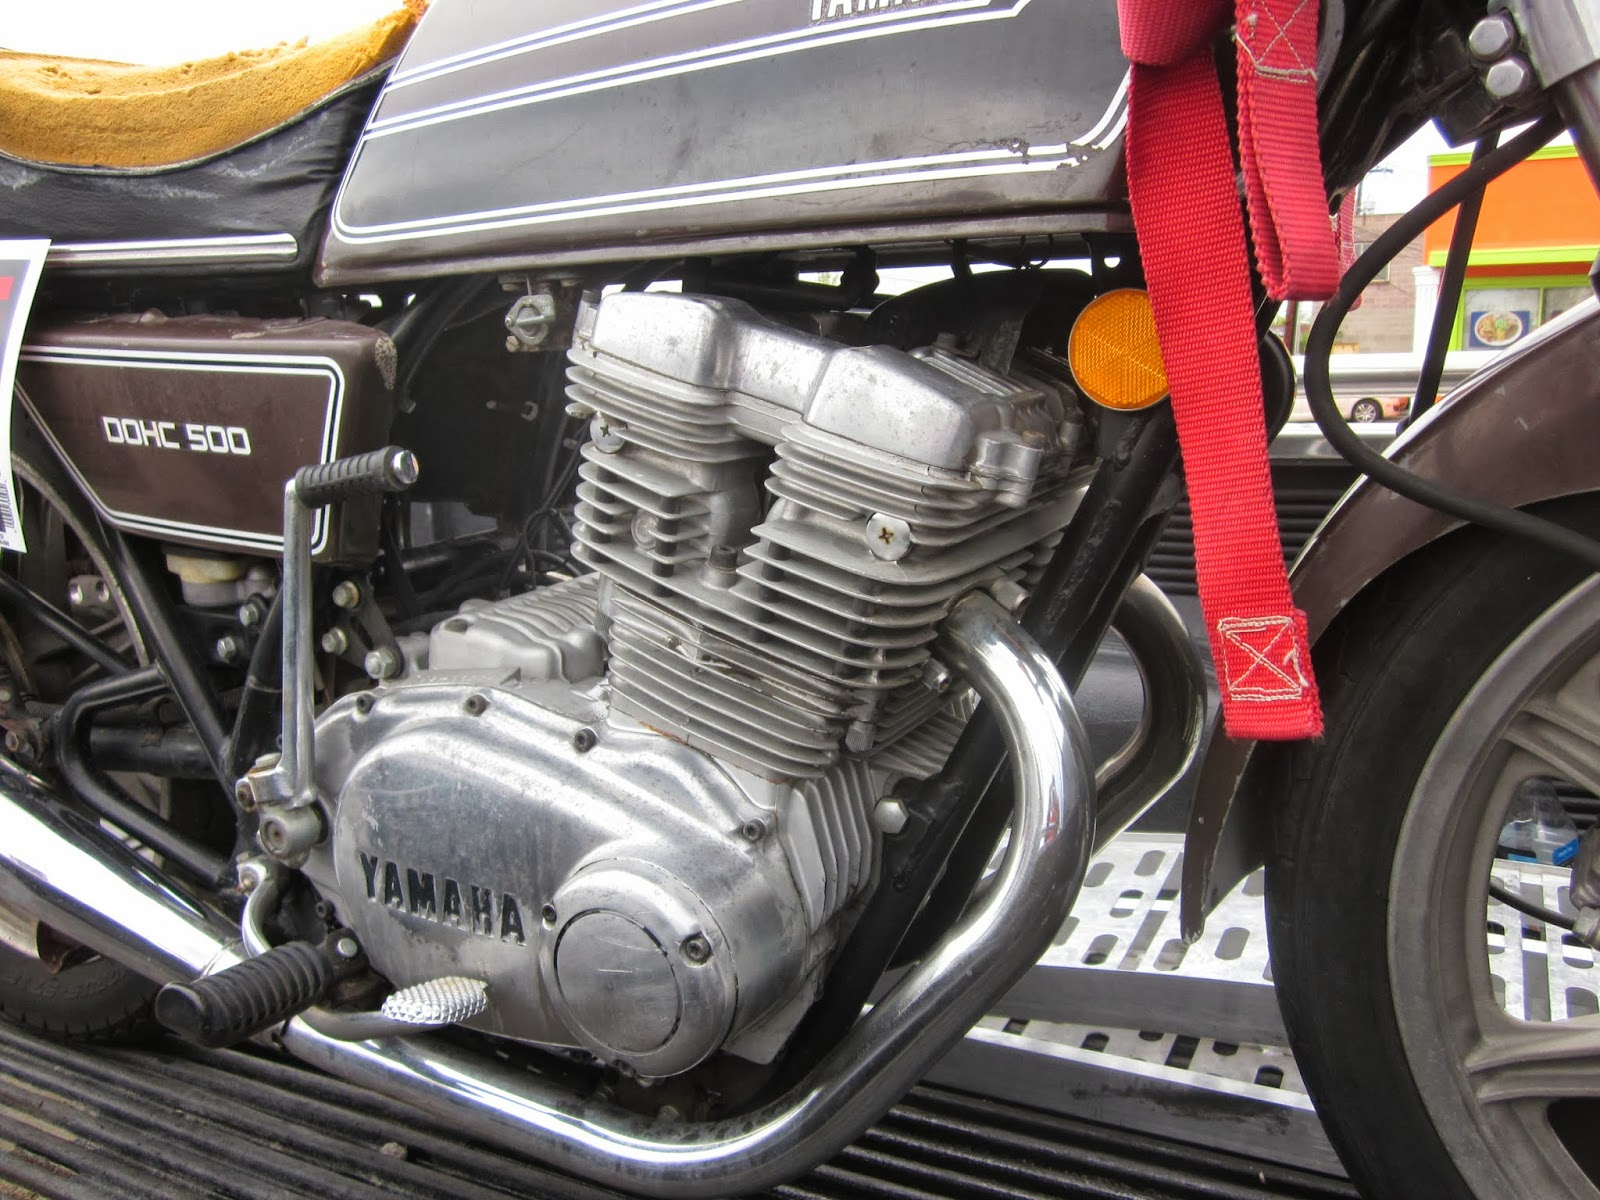 OldMotoDude  1976 Yamaha XS500 for sale at the 2013 Retro Riders